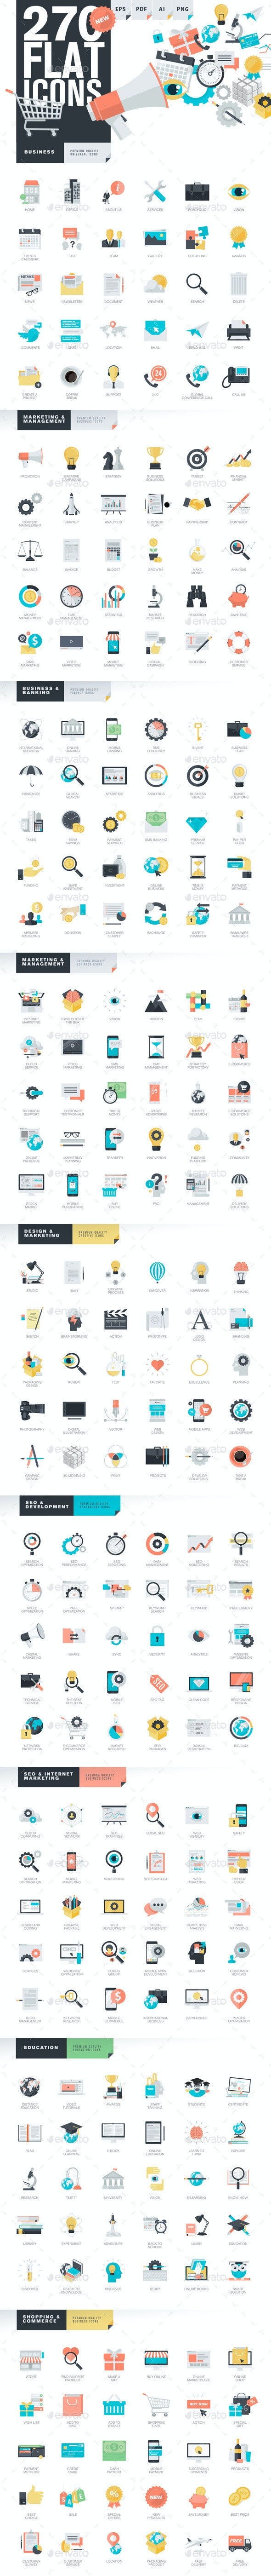 Modern Flat Design Style Icons